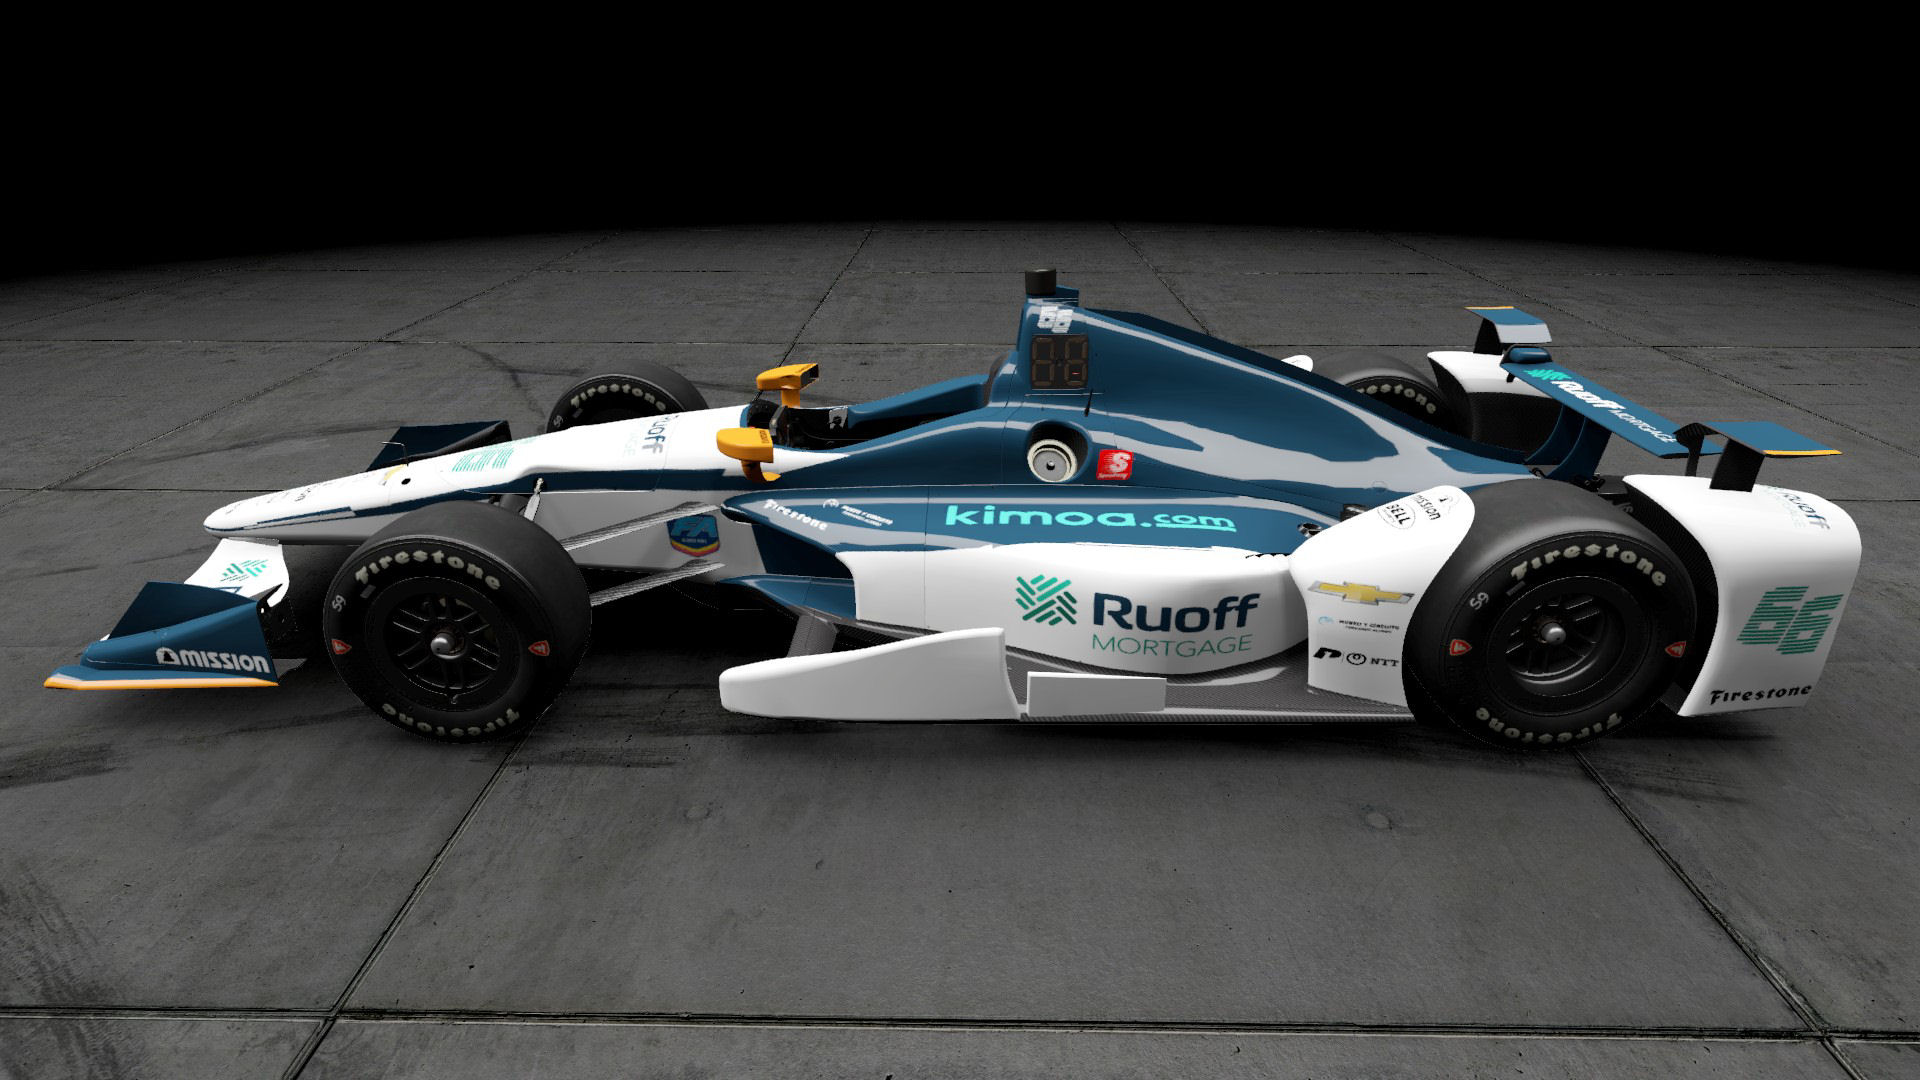 Fernando Alonso 2020 Indy 500 Mclaren dallara dw12 chevy oval 02.jpg